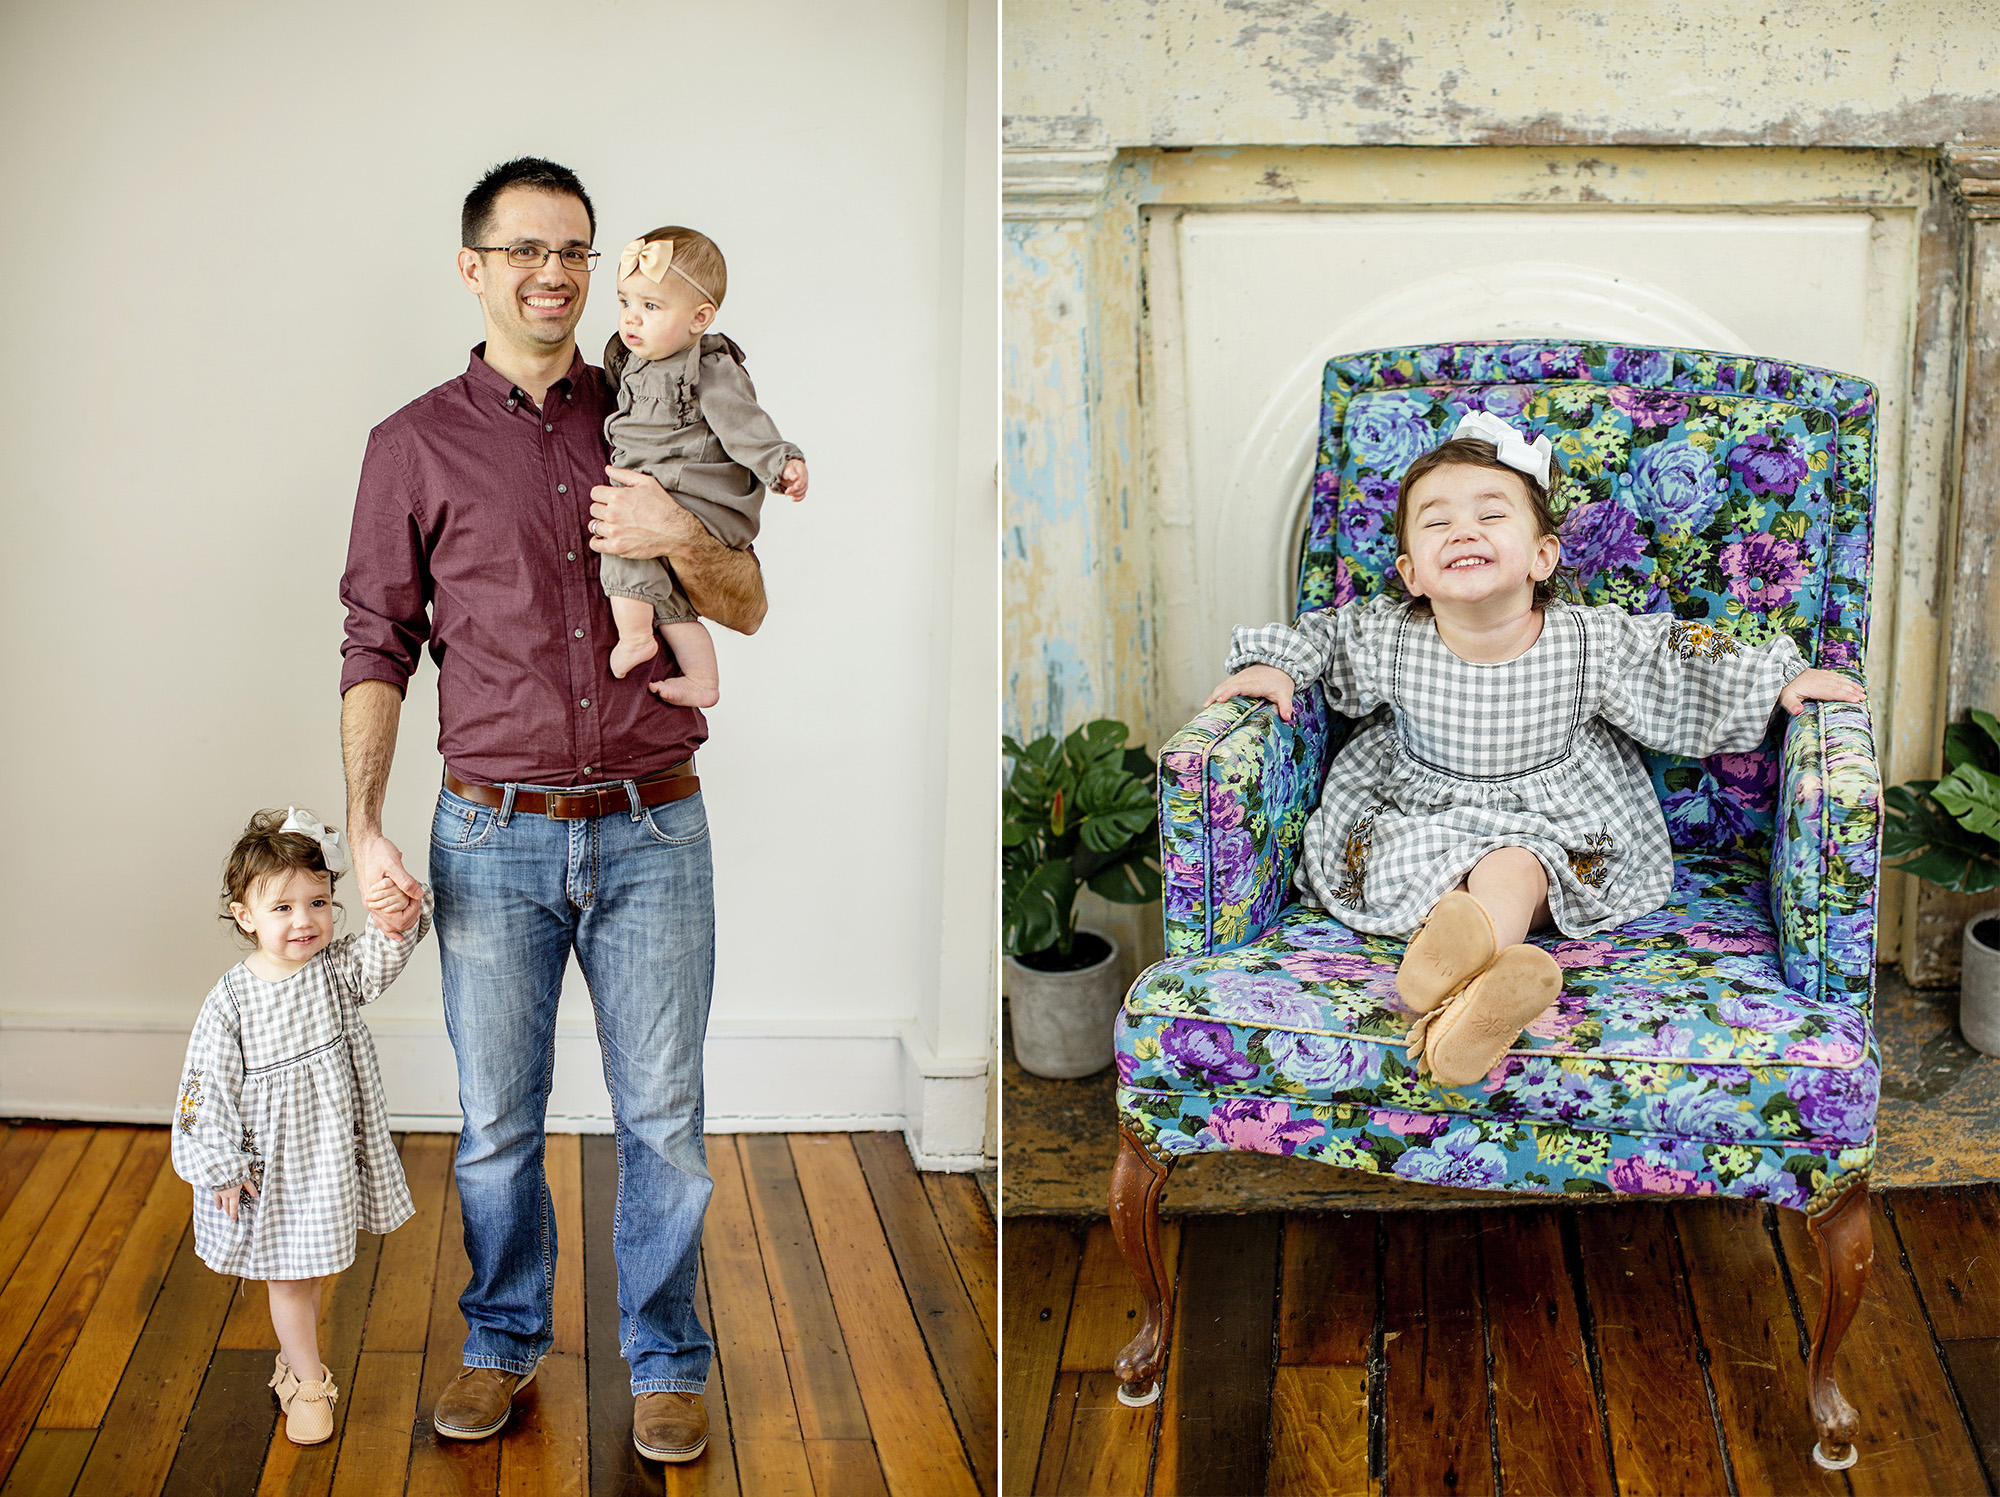 Seriously_Sabrina_Photography_Lexington_Kentucky_Studio_Lex_Portraits_Family_Oyler17.jpg